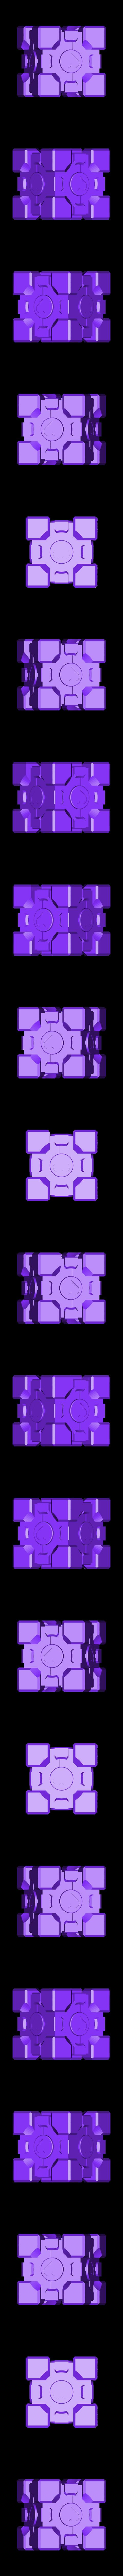 Companion Cube.stl Download free STL file Companion Cube • 3D printing design, Kurtis